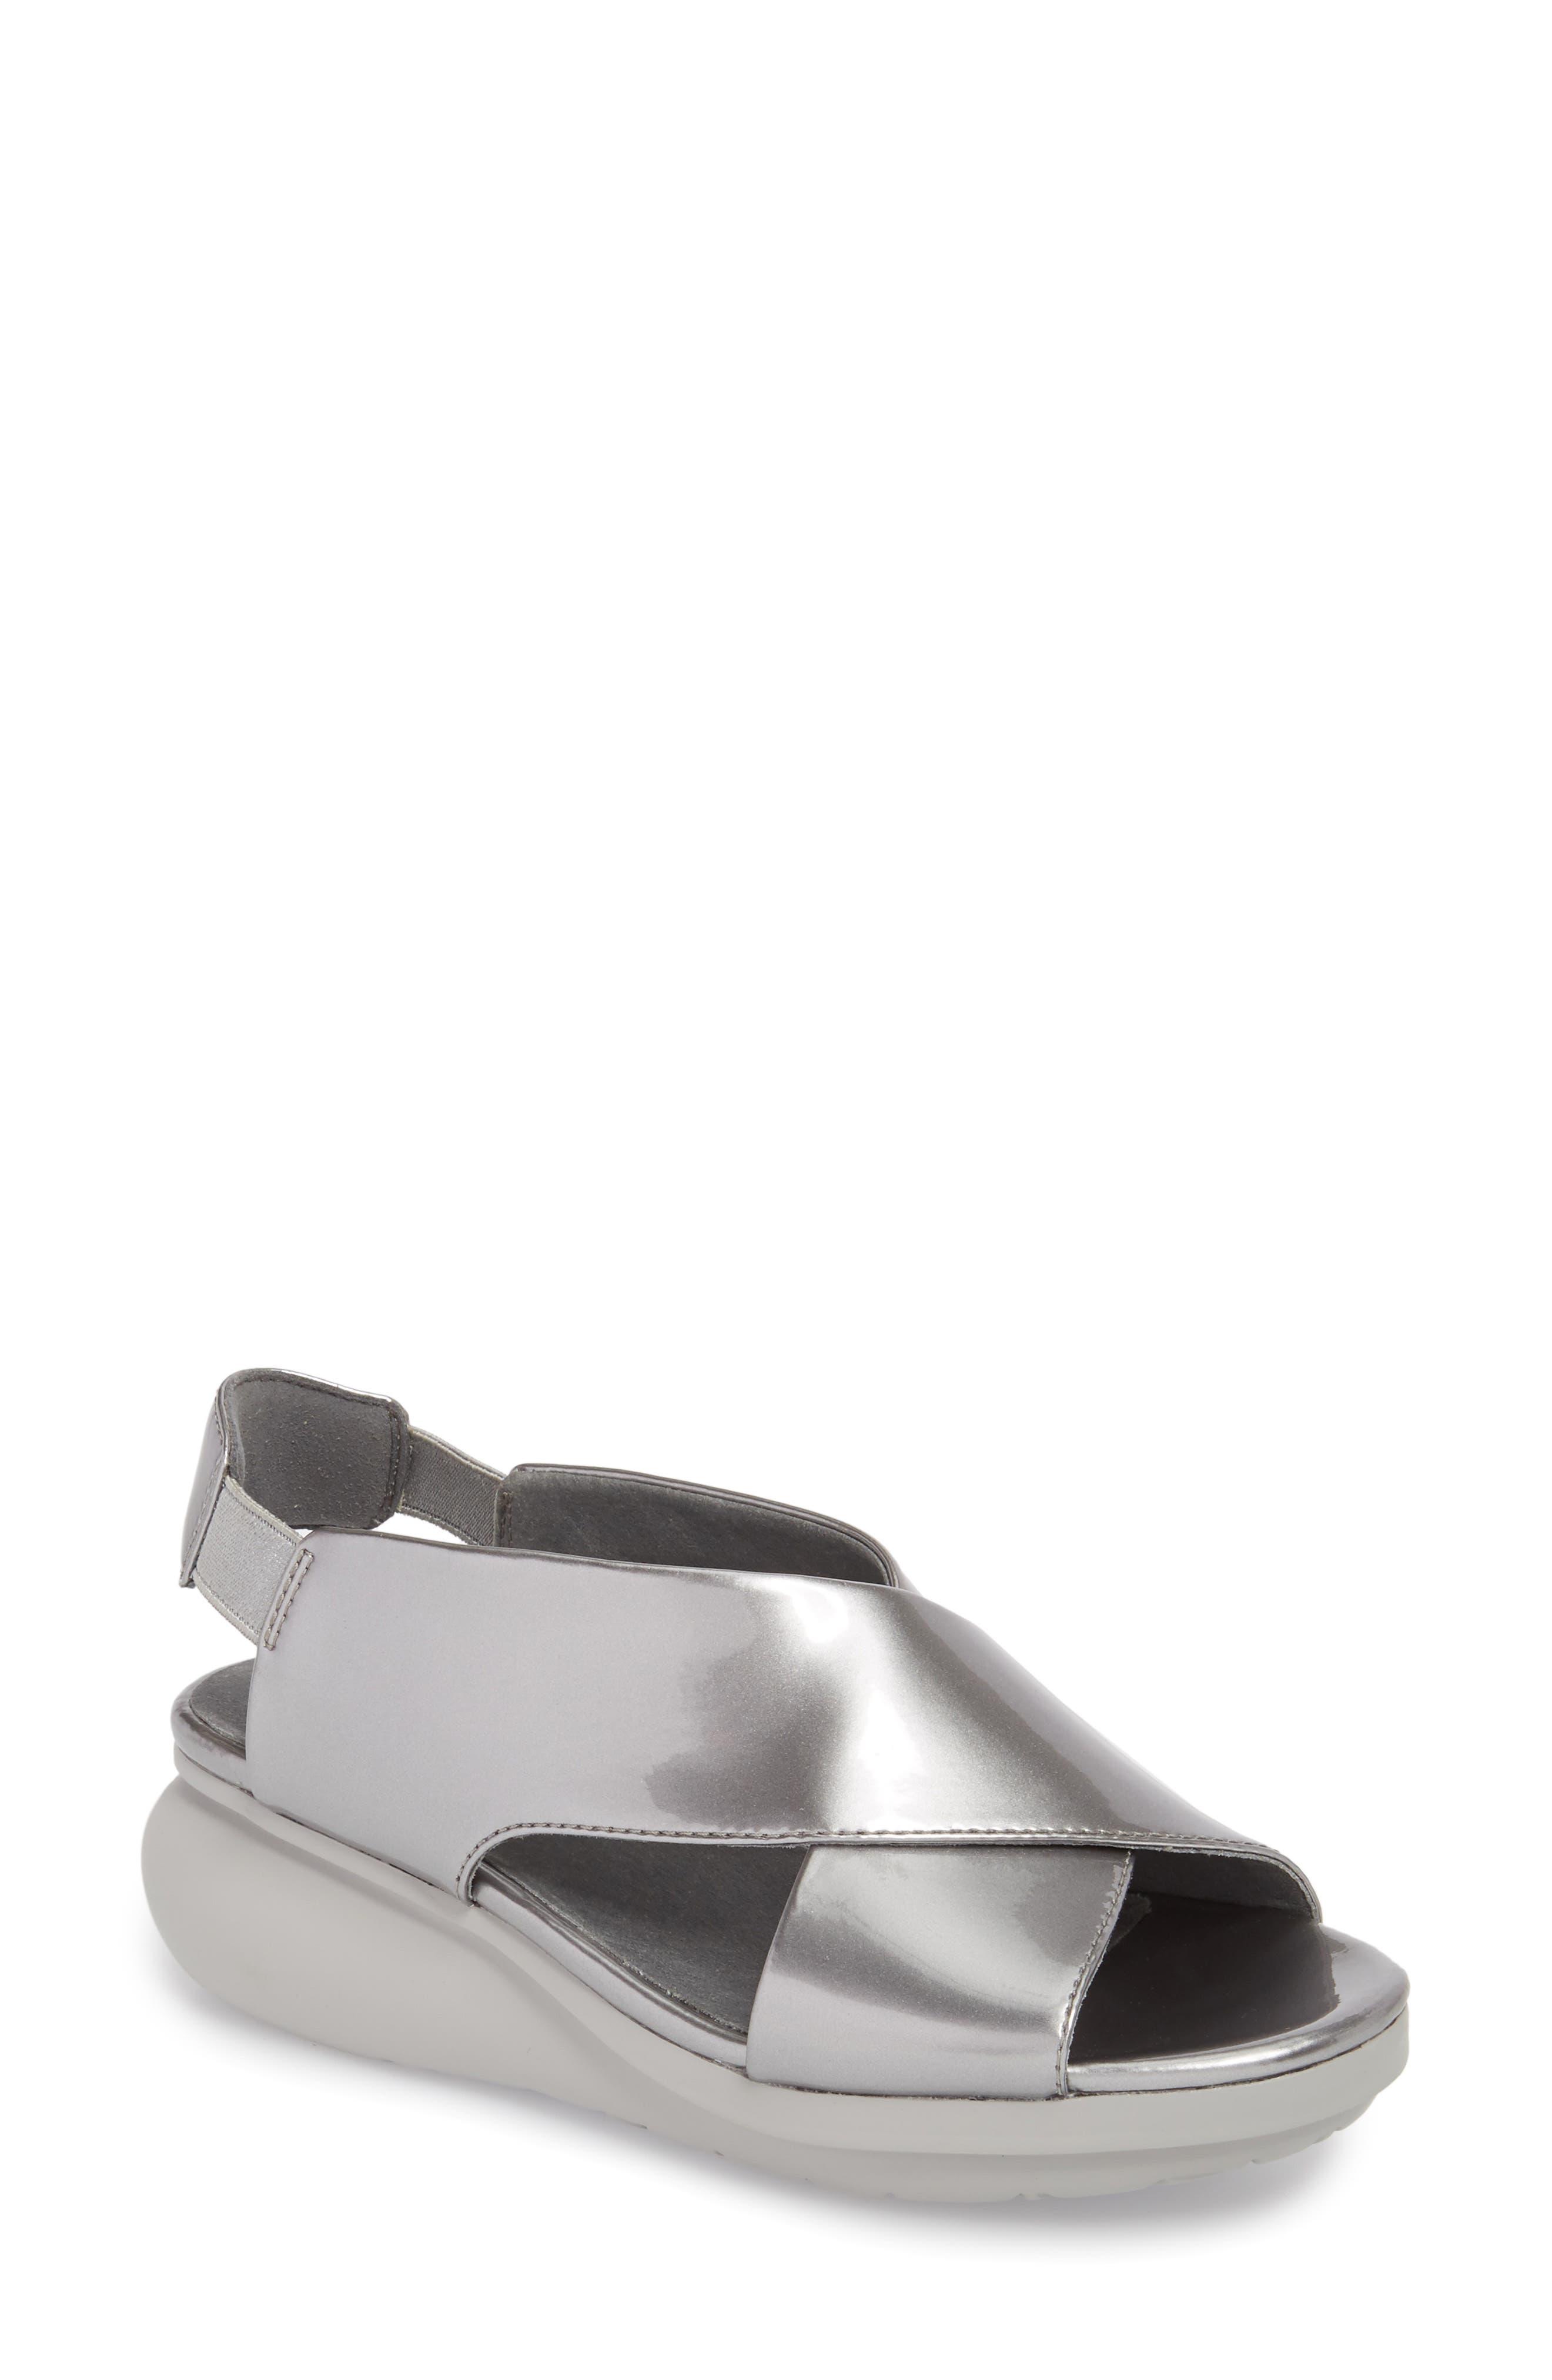 Balloon Wedge Sandal,                             Main thumbnail 1, color,                             Medium Gray Leather